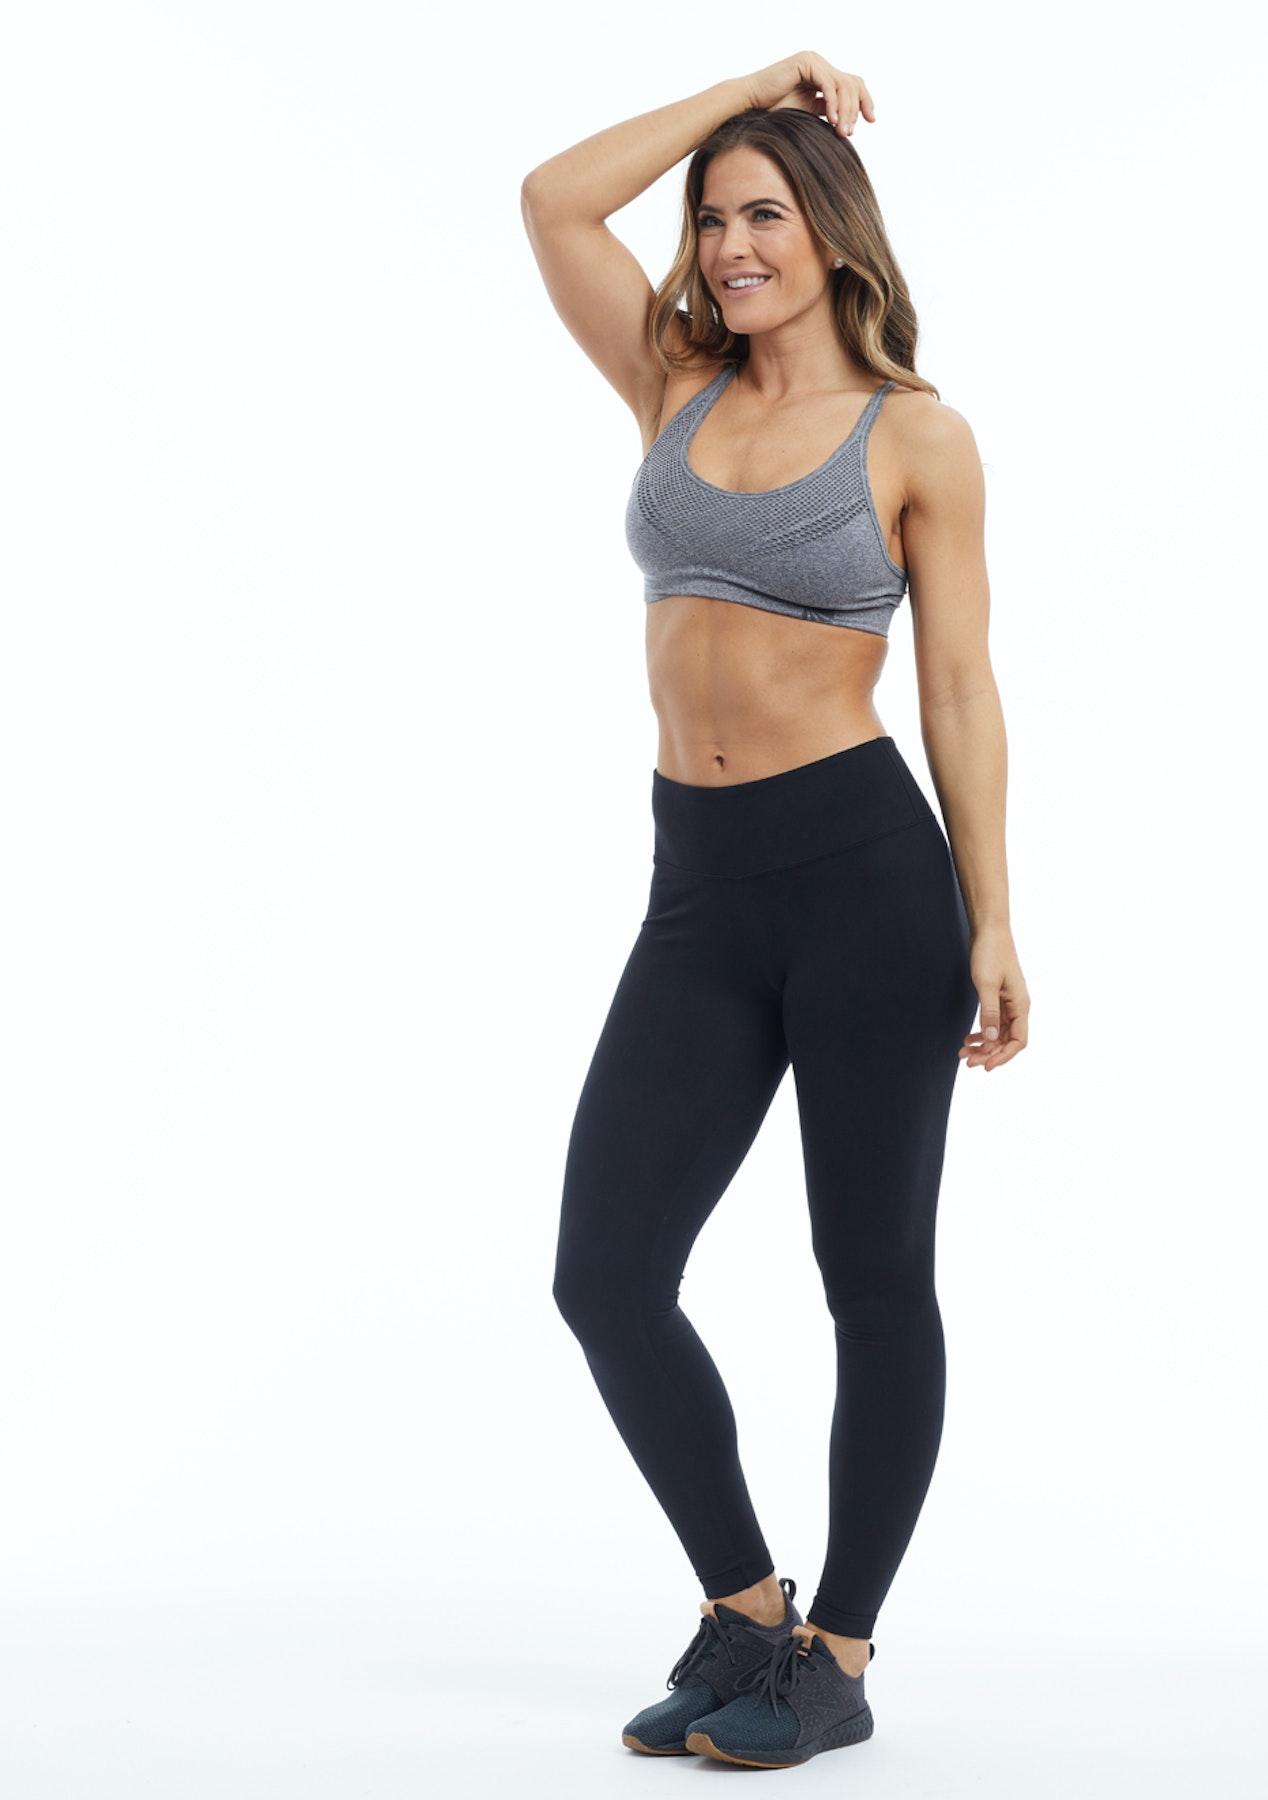 ce4f7297e0 Marika - Skylar Sport Bra - (Sch)Heather Ch - Marika Activewear Nothing  Over  40 - Onceit